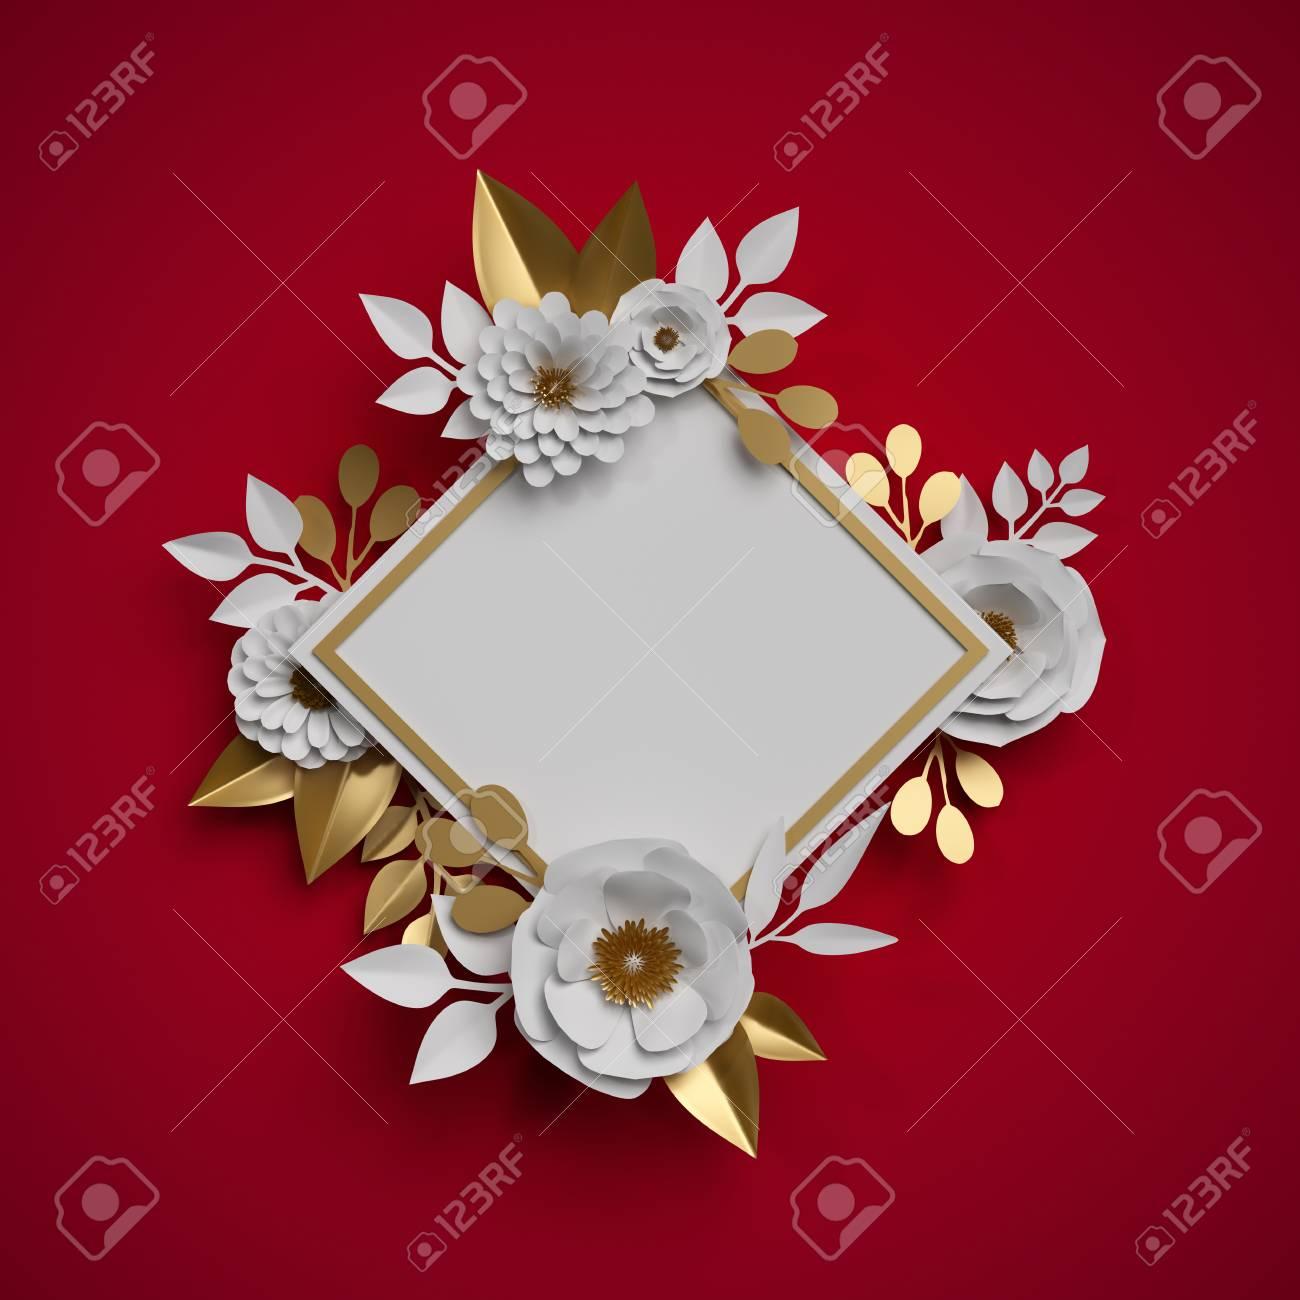 3d Render White Gold Paper Flowers Botanical Frame Red Background